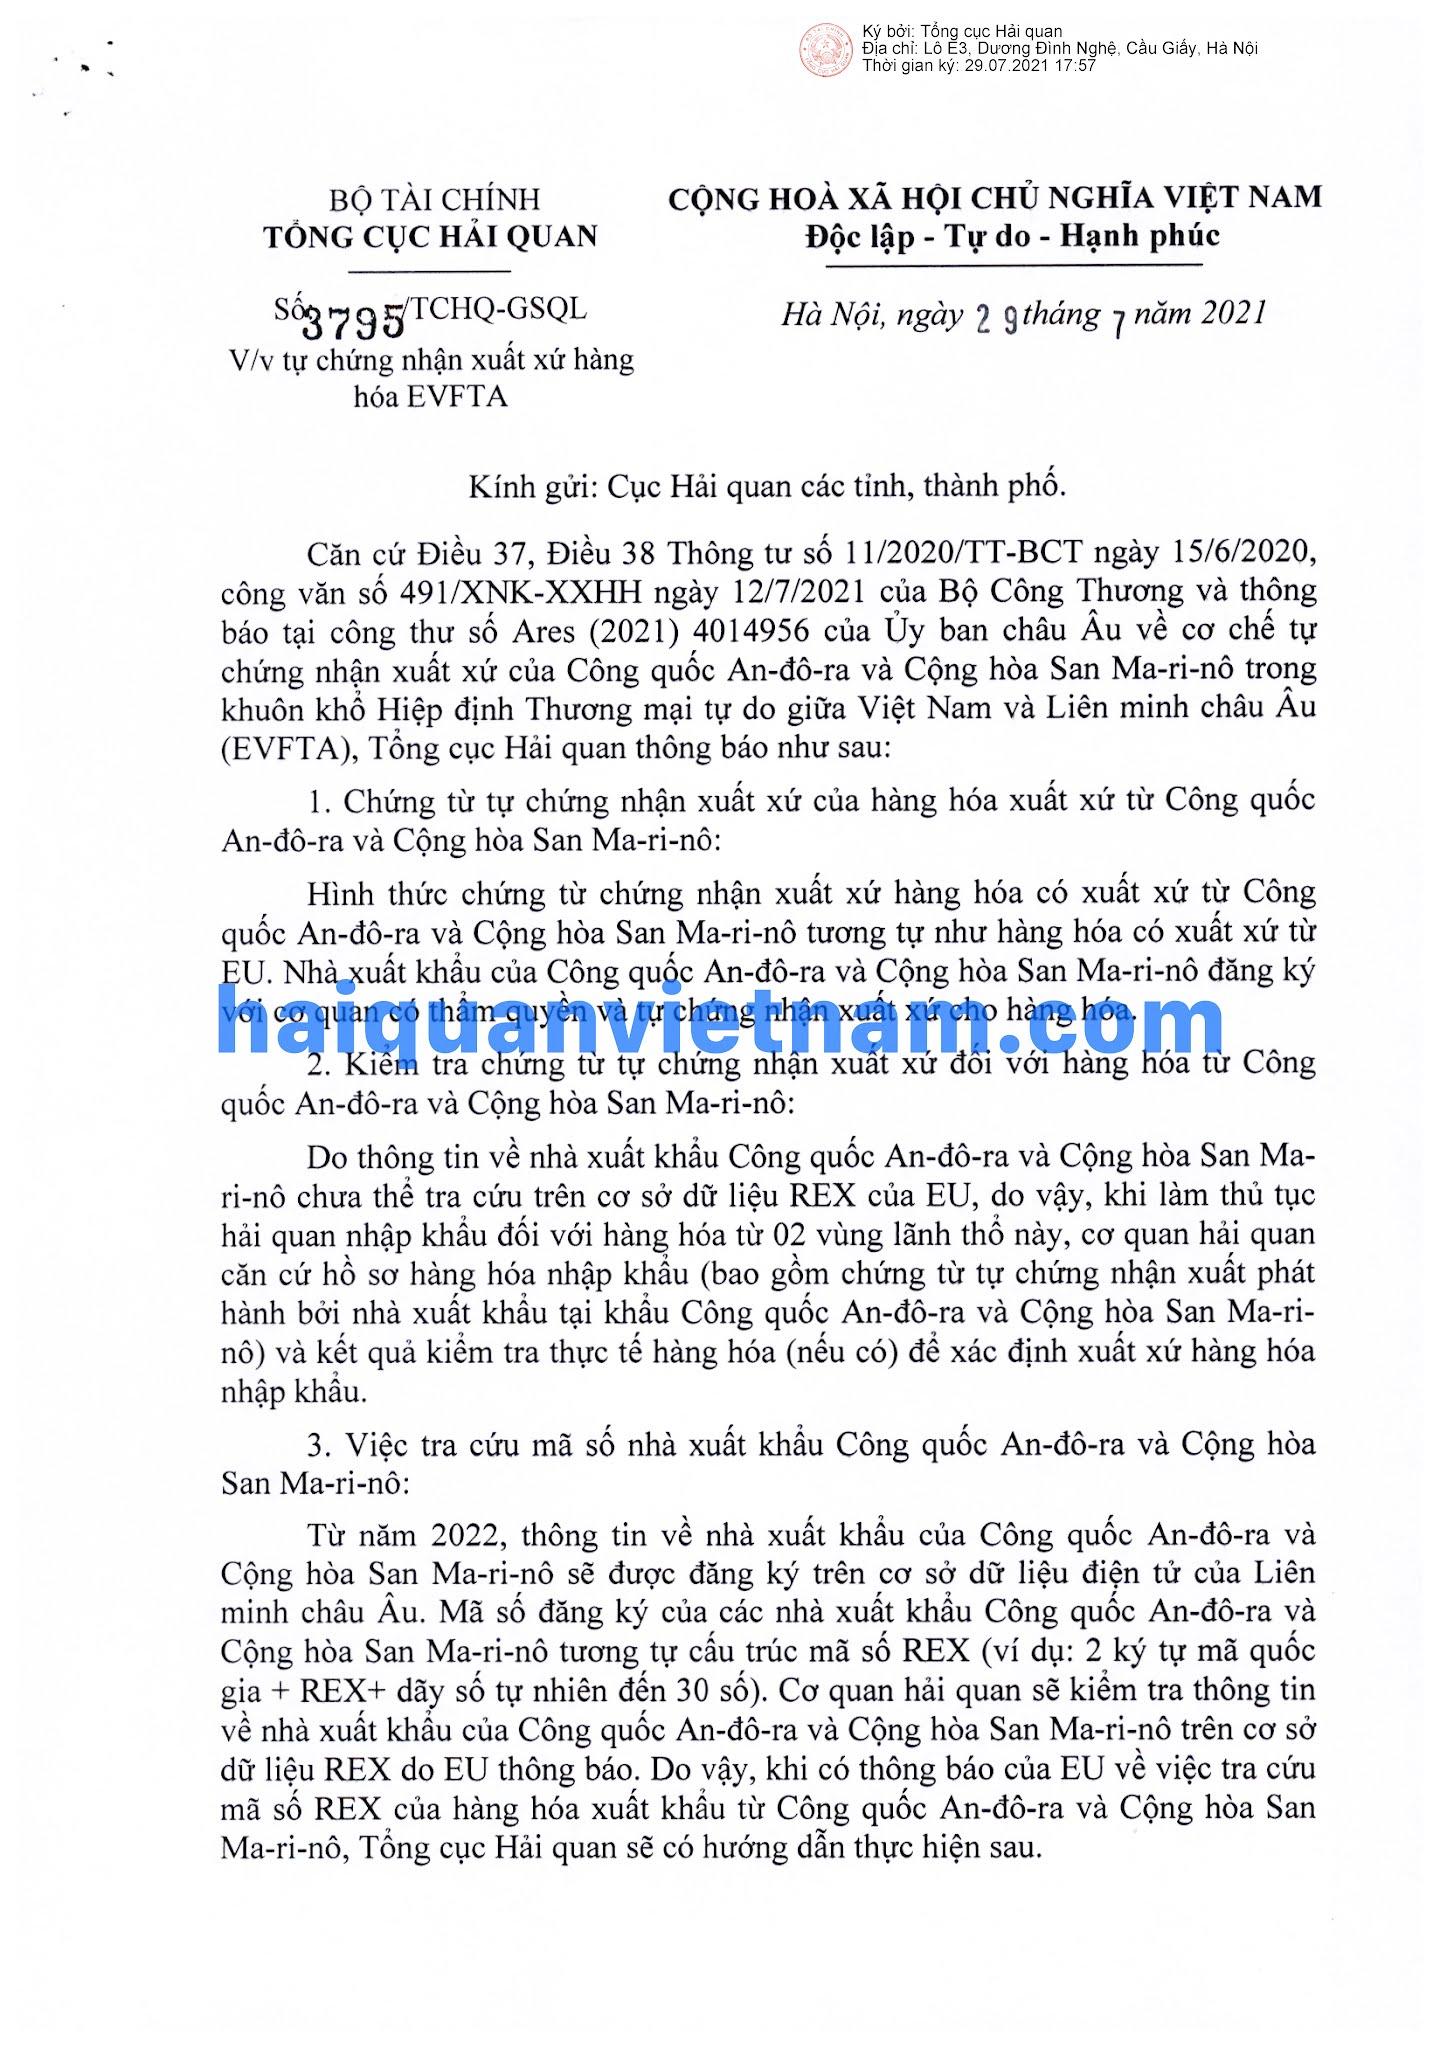 [Image: 210729%2B-%2B3795-TCHQ-GSQL_haiquanvietnam_01.jpg]